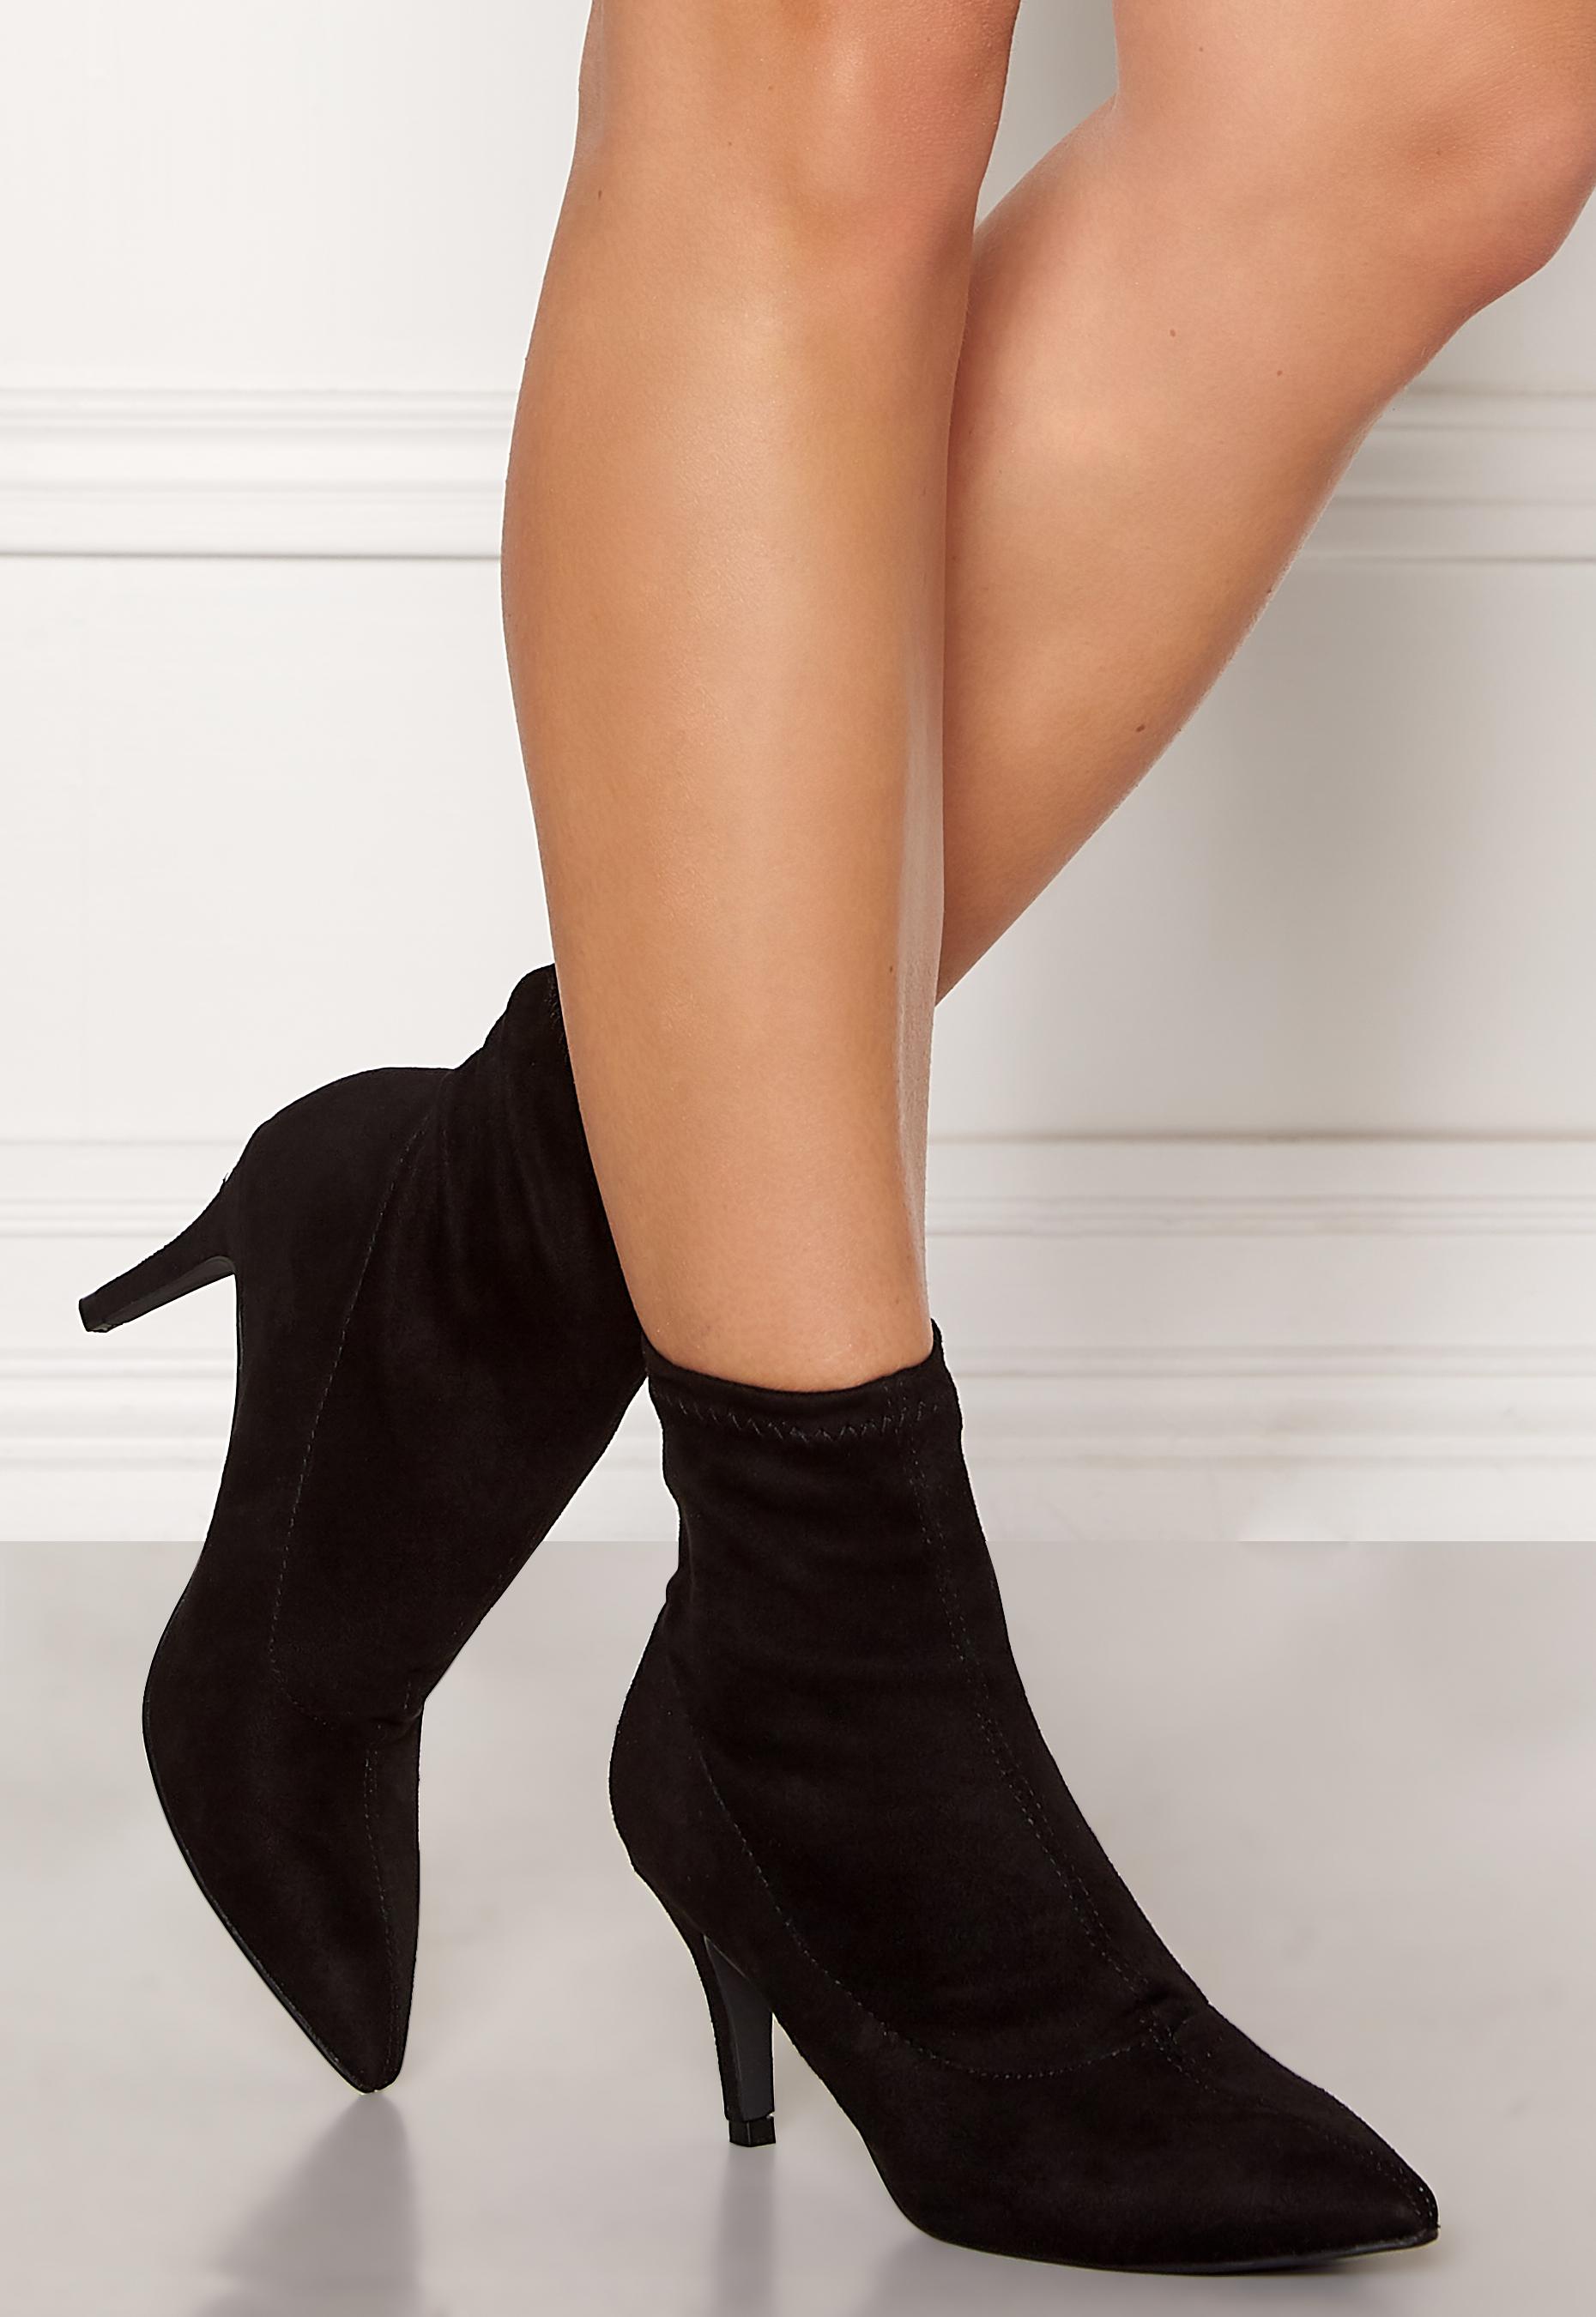 a080bfe613c New Look Beanie Sock Kitten Boots Black - Bubbleroom